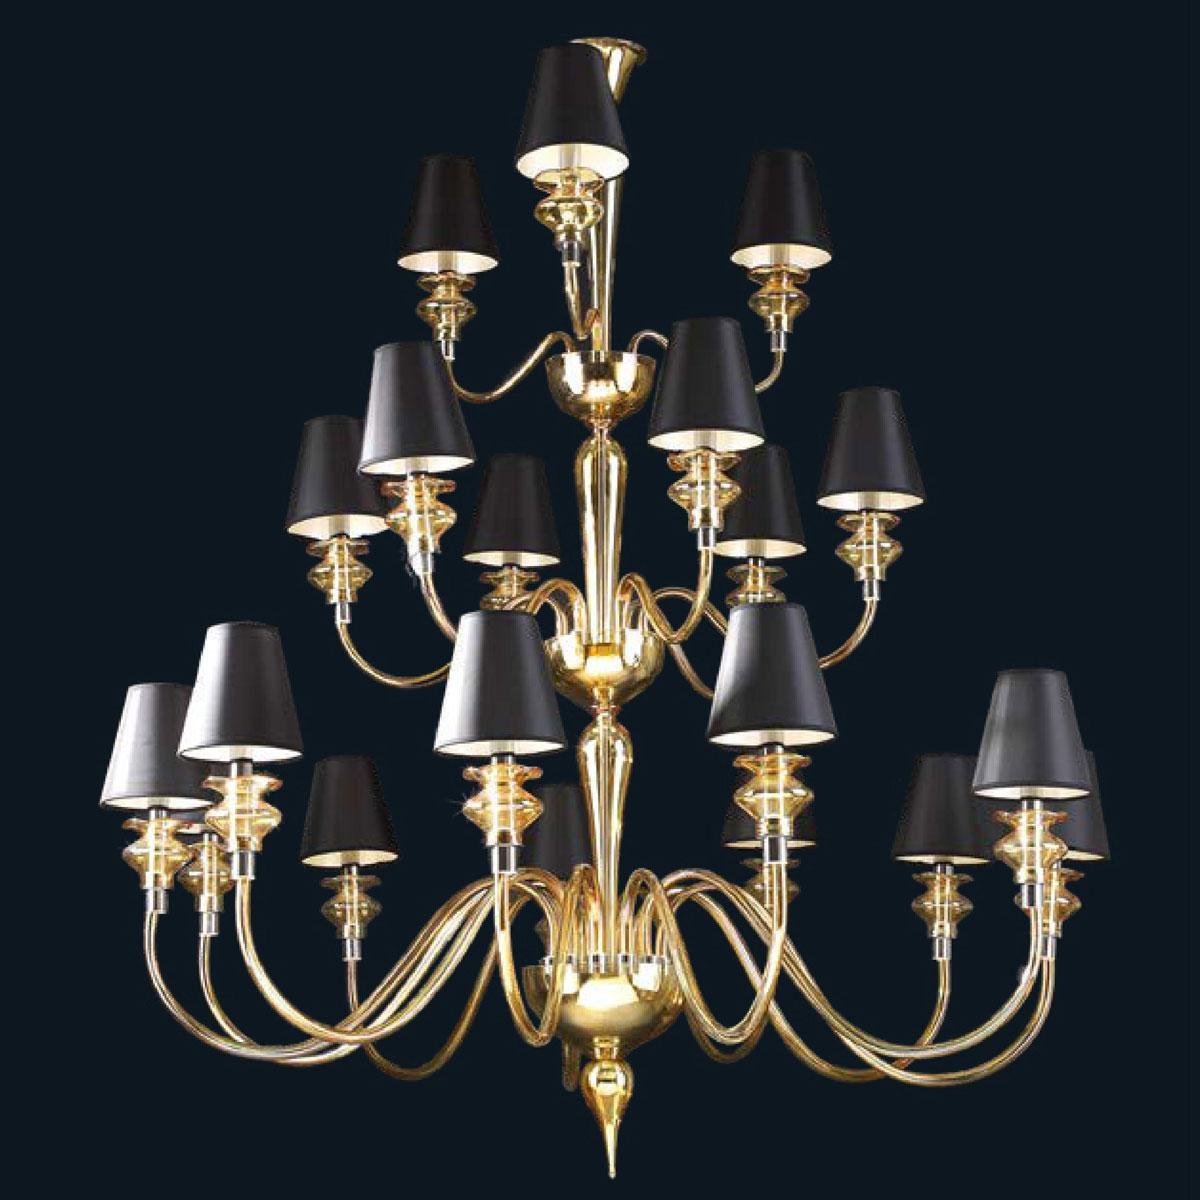 """Cadi"" lustre en cristal de Murano avec abat-jour - 12+6+3 lumières - ambre"